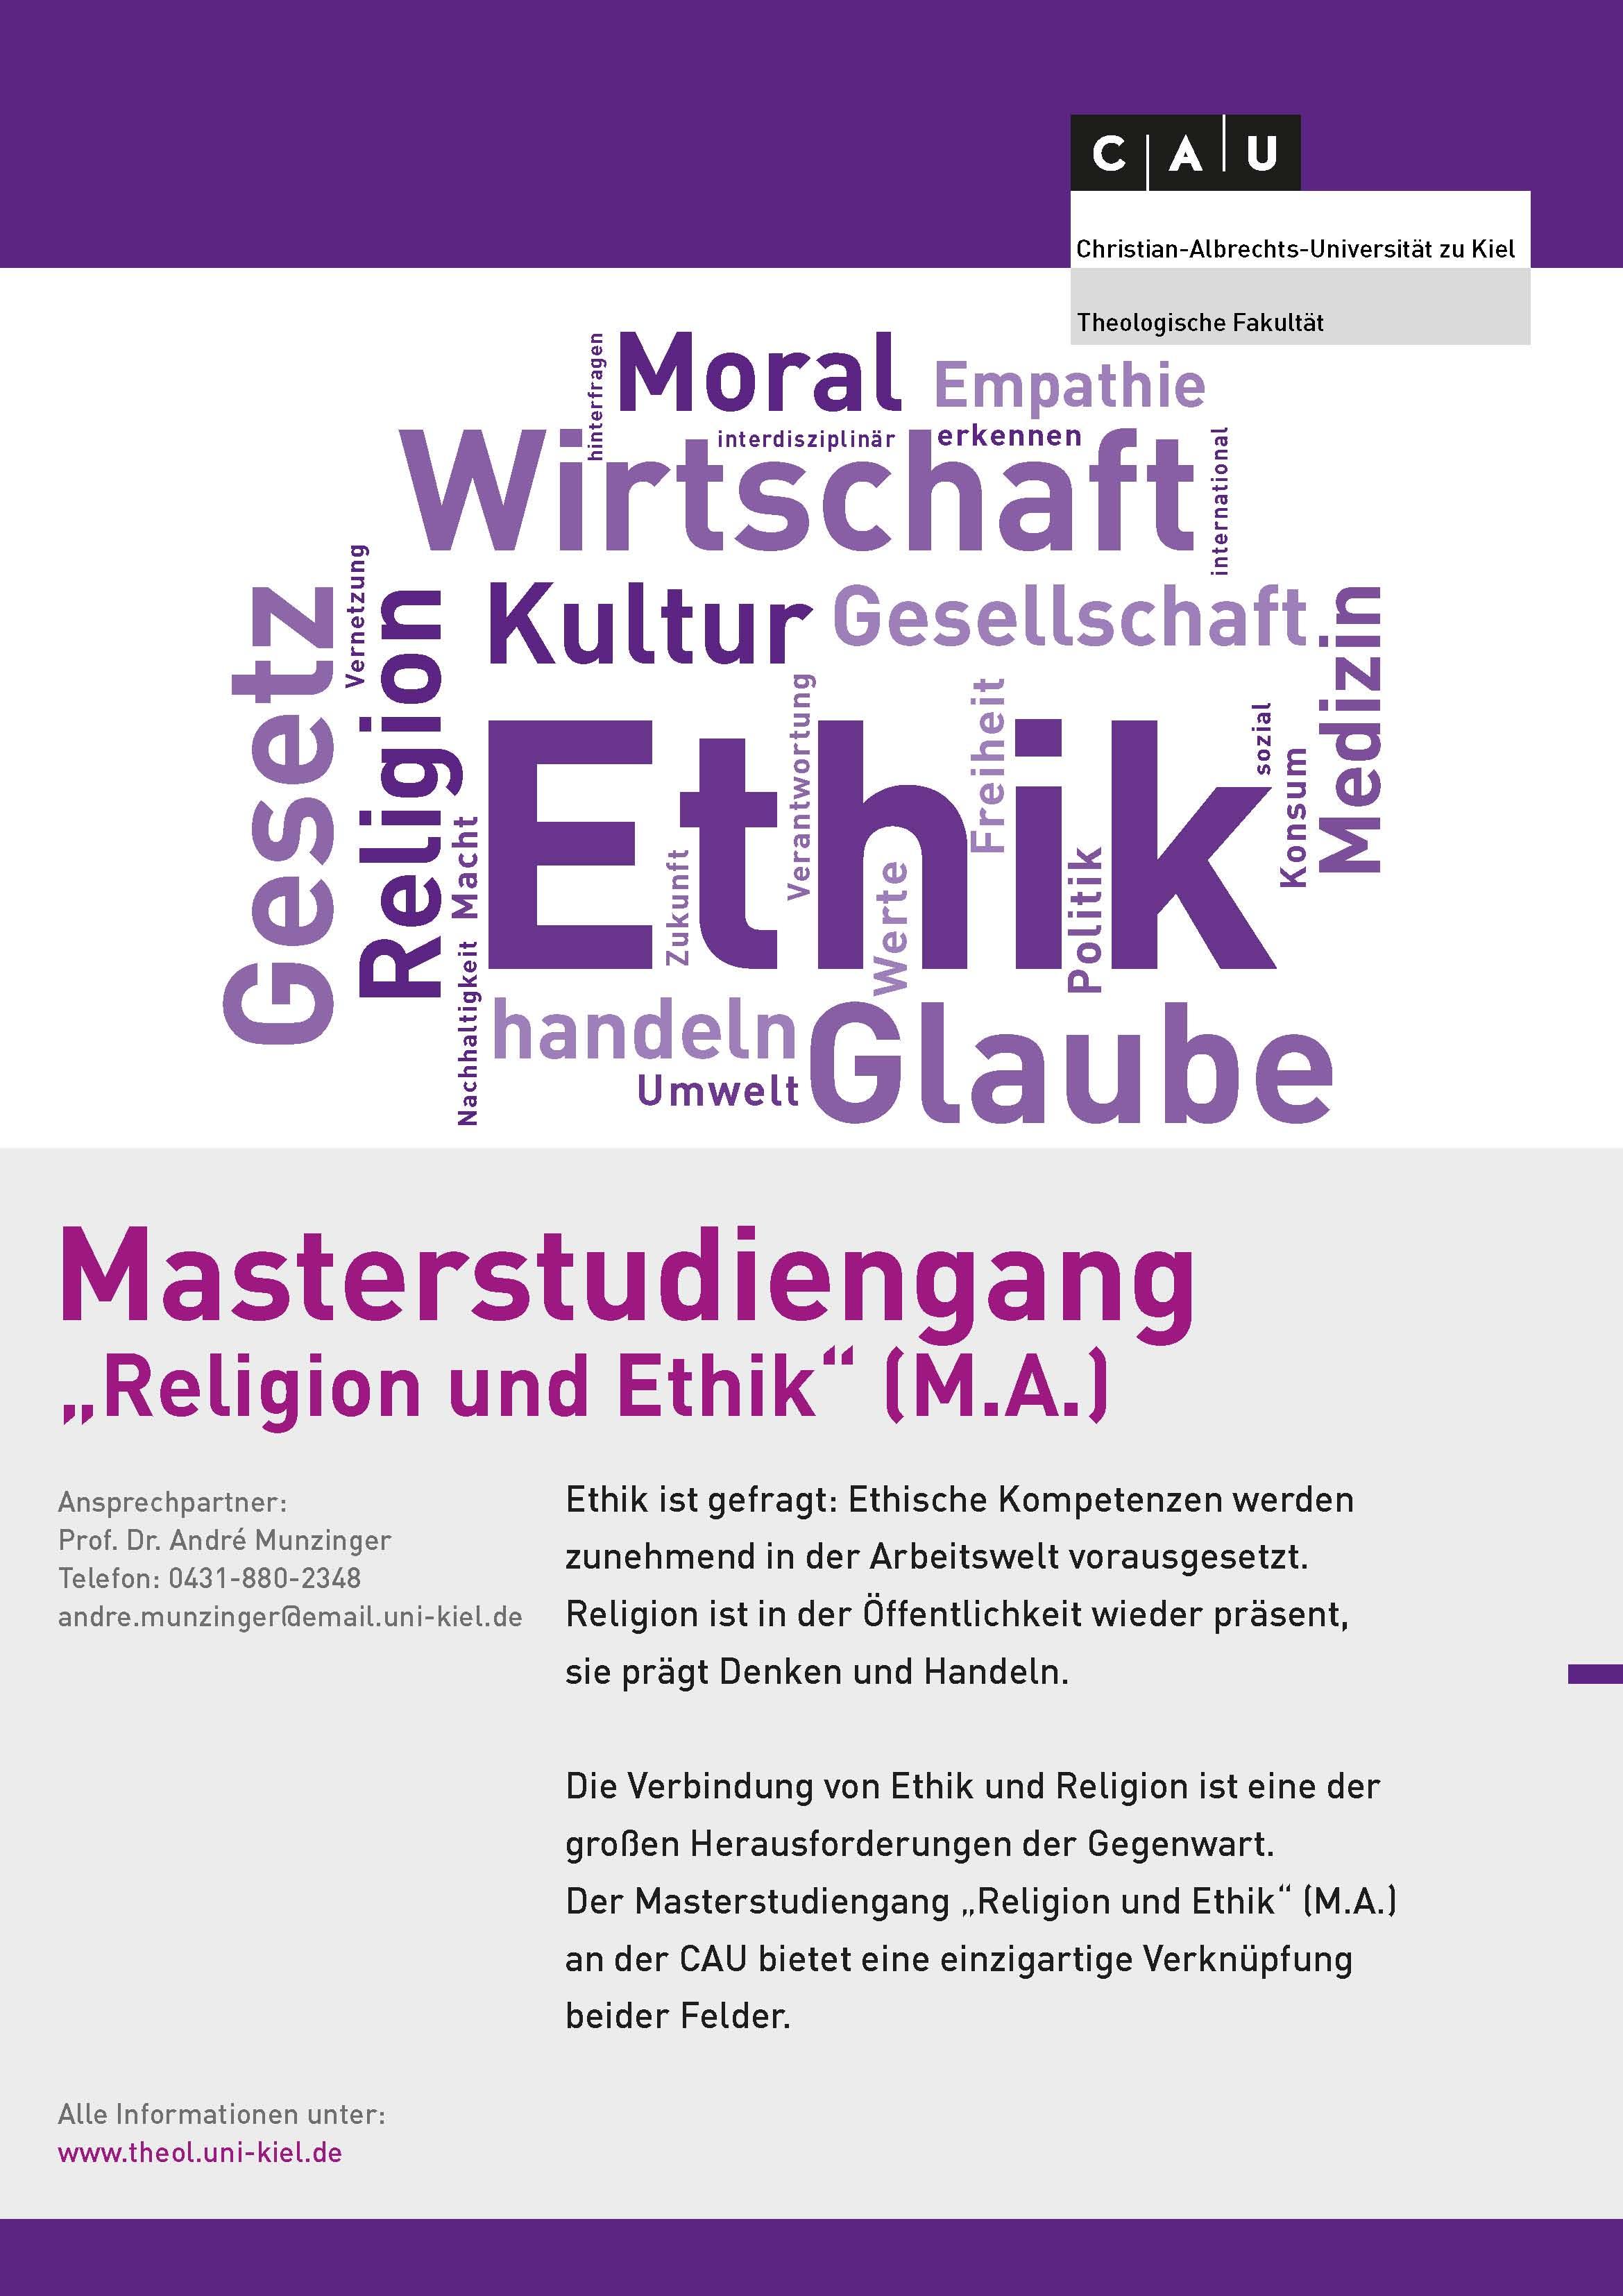 Masterstudiengang Religion und Ethik Plakat